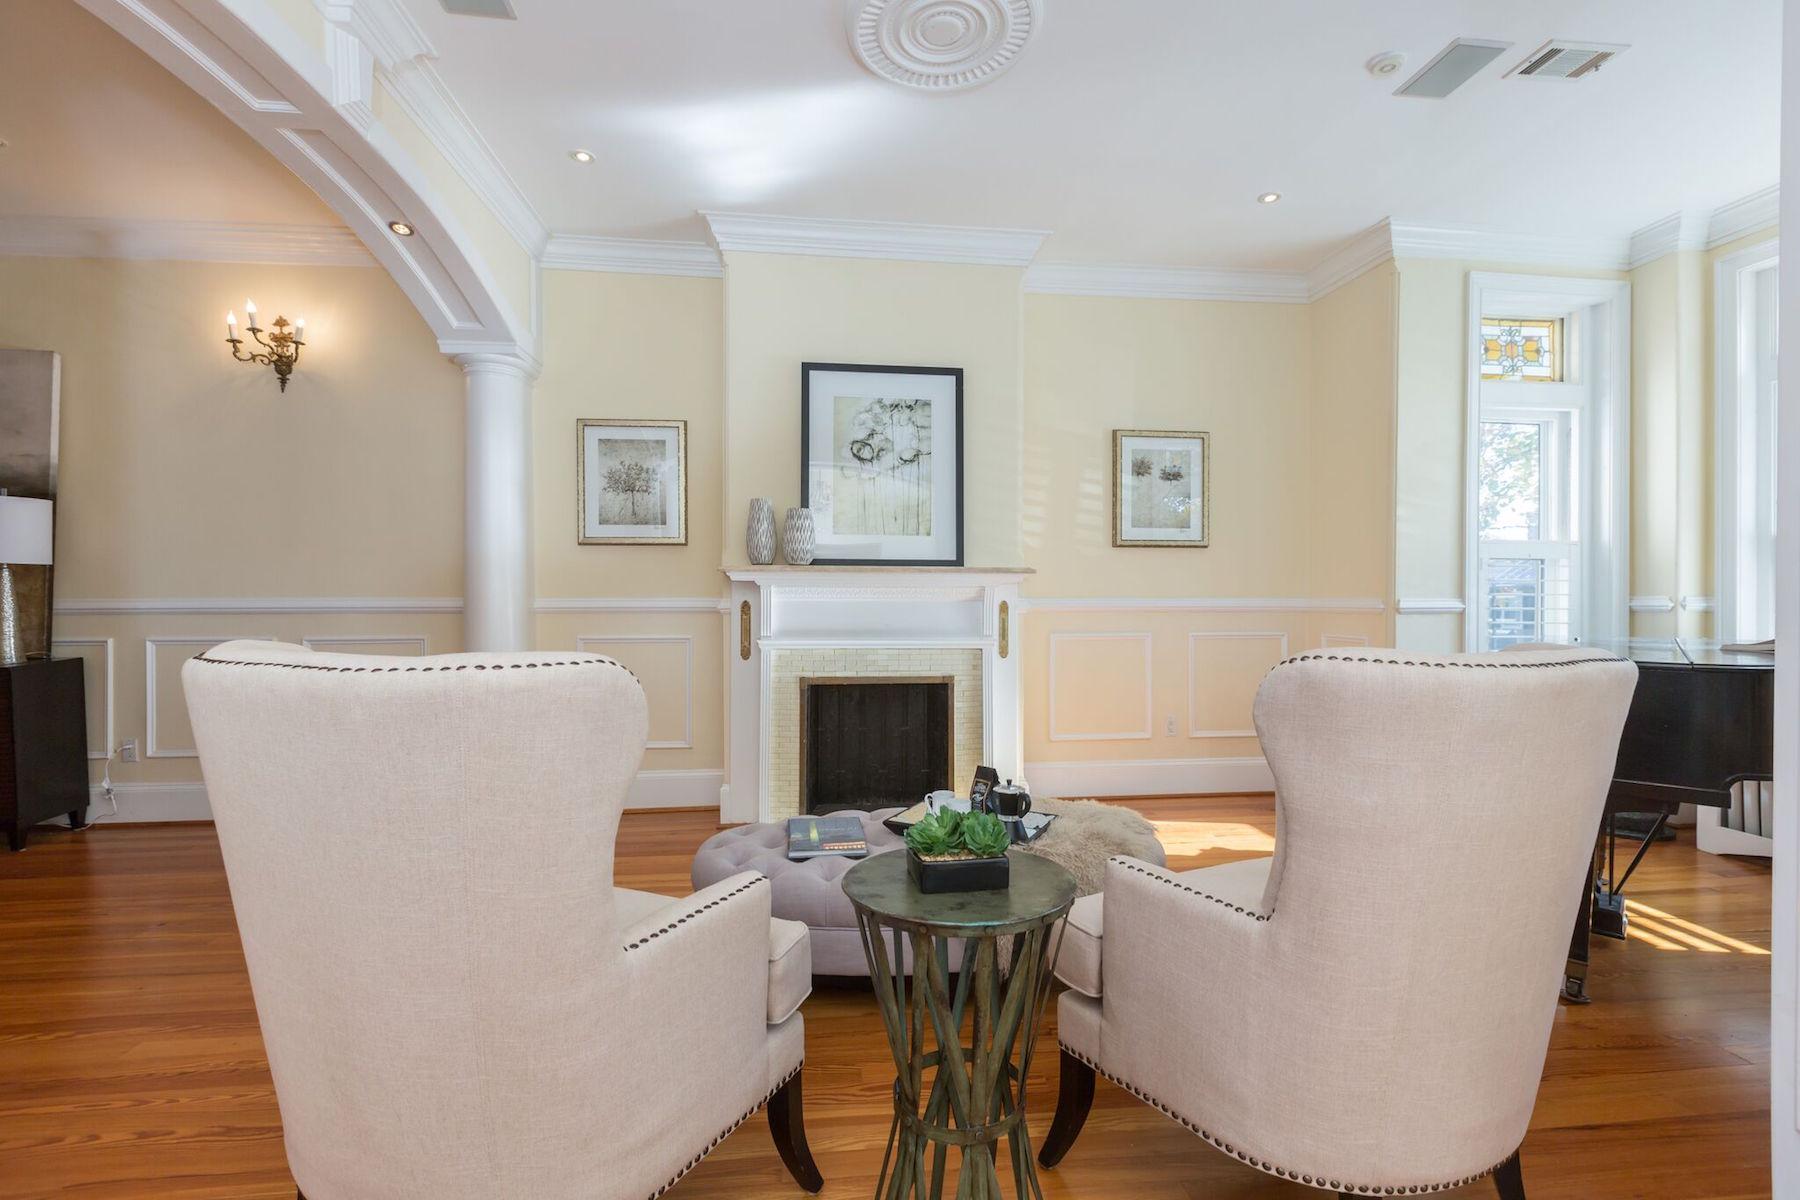 Additional photo for property listing at 2715 P Street Nw, Washington  Washington, District Of Columbia 20007 United States